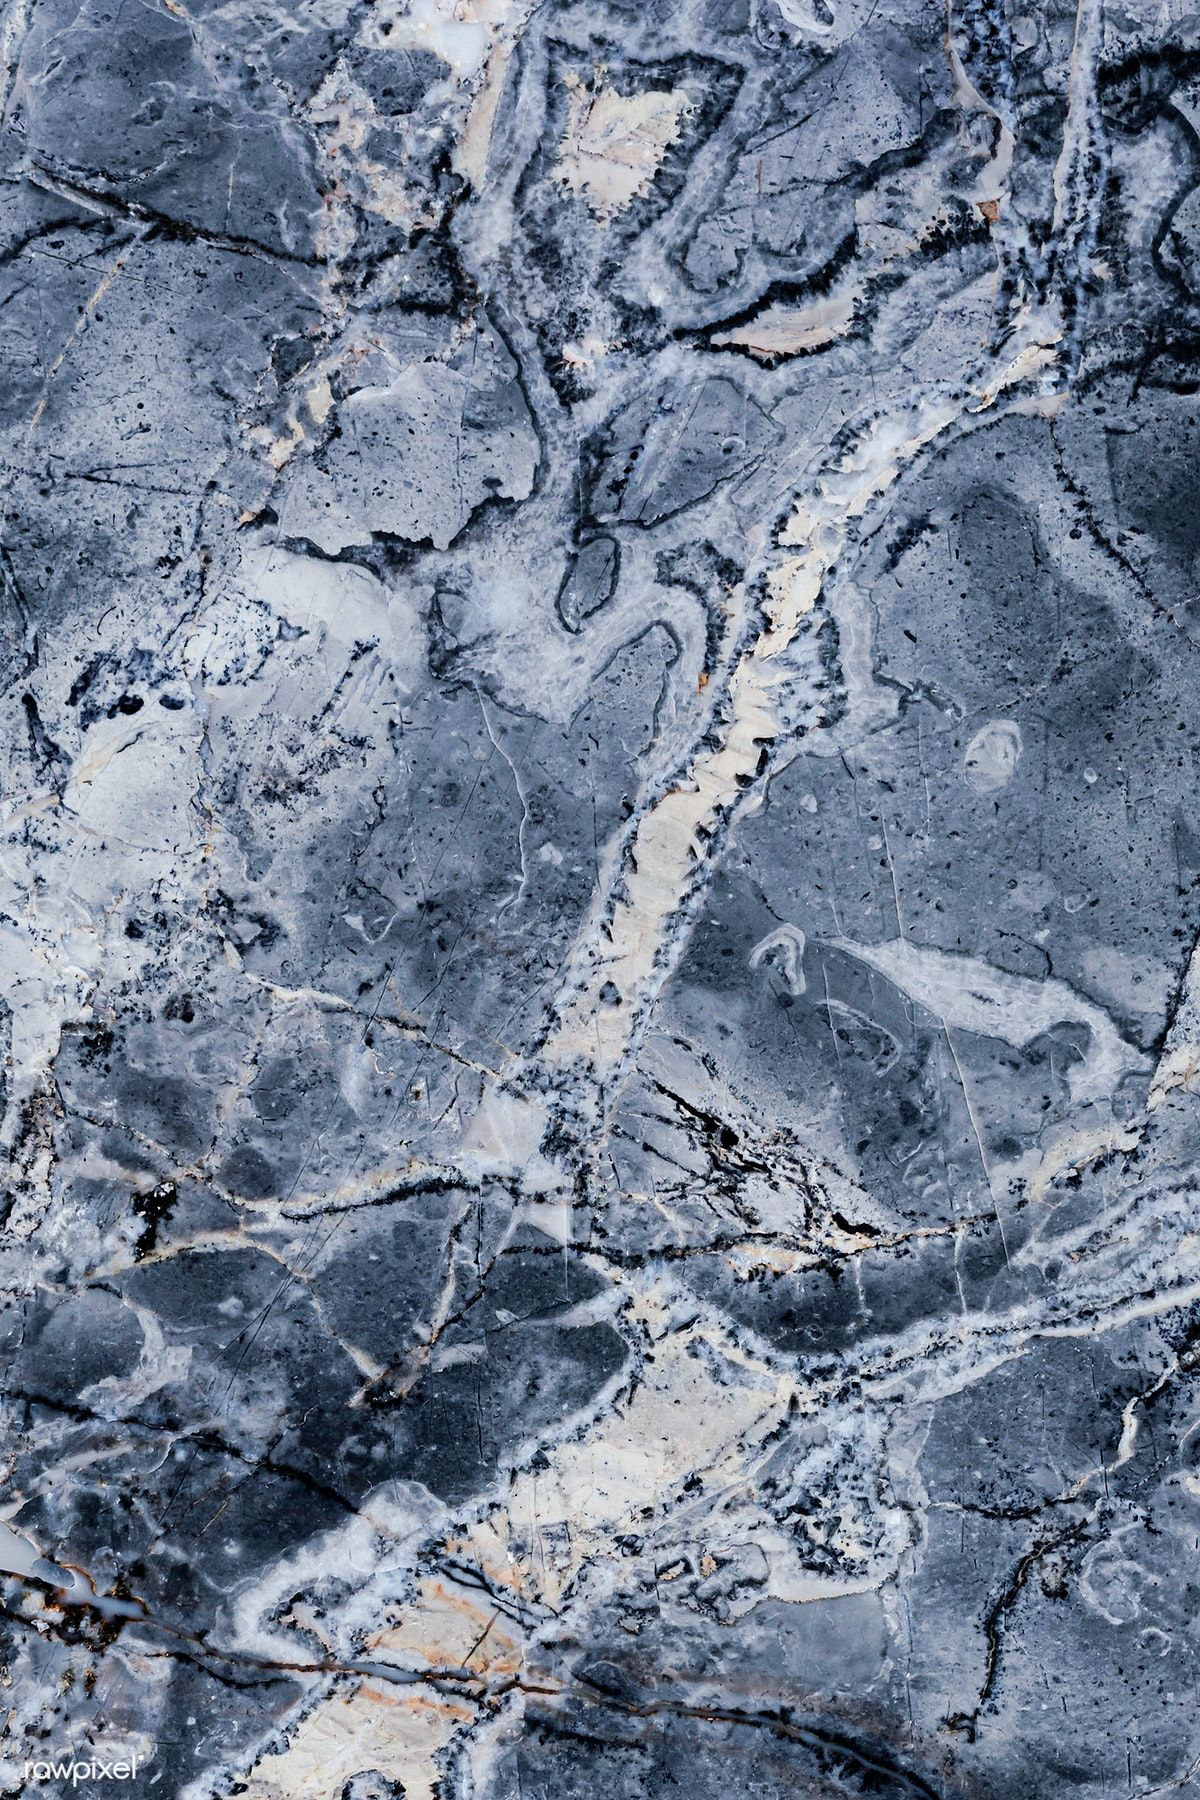 Download Premium Image Of Blue Marble Texture With Streaks 2036934 In 2020 Marble Texture Blue Marble Blue Marble Tile